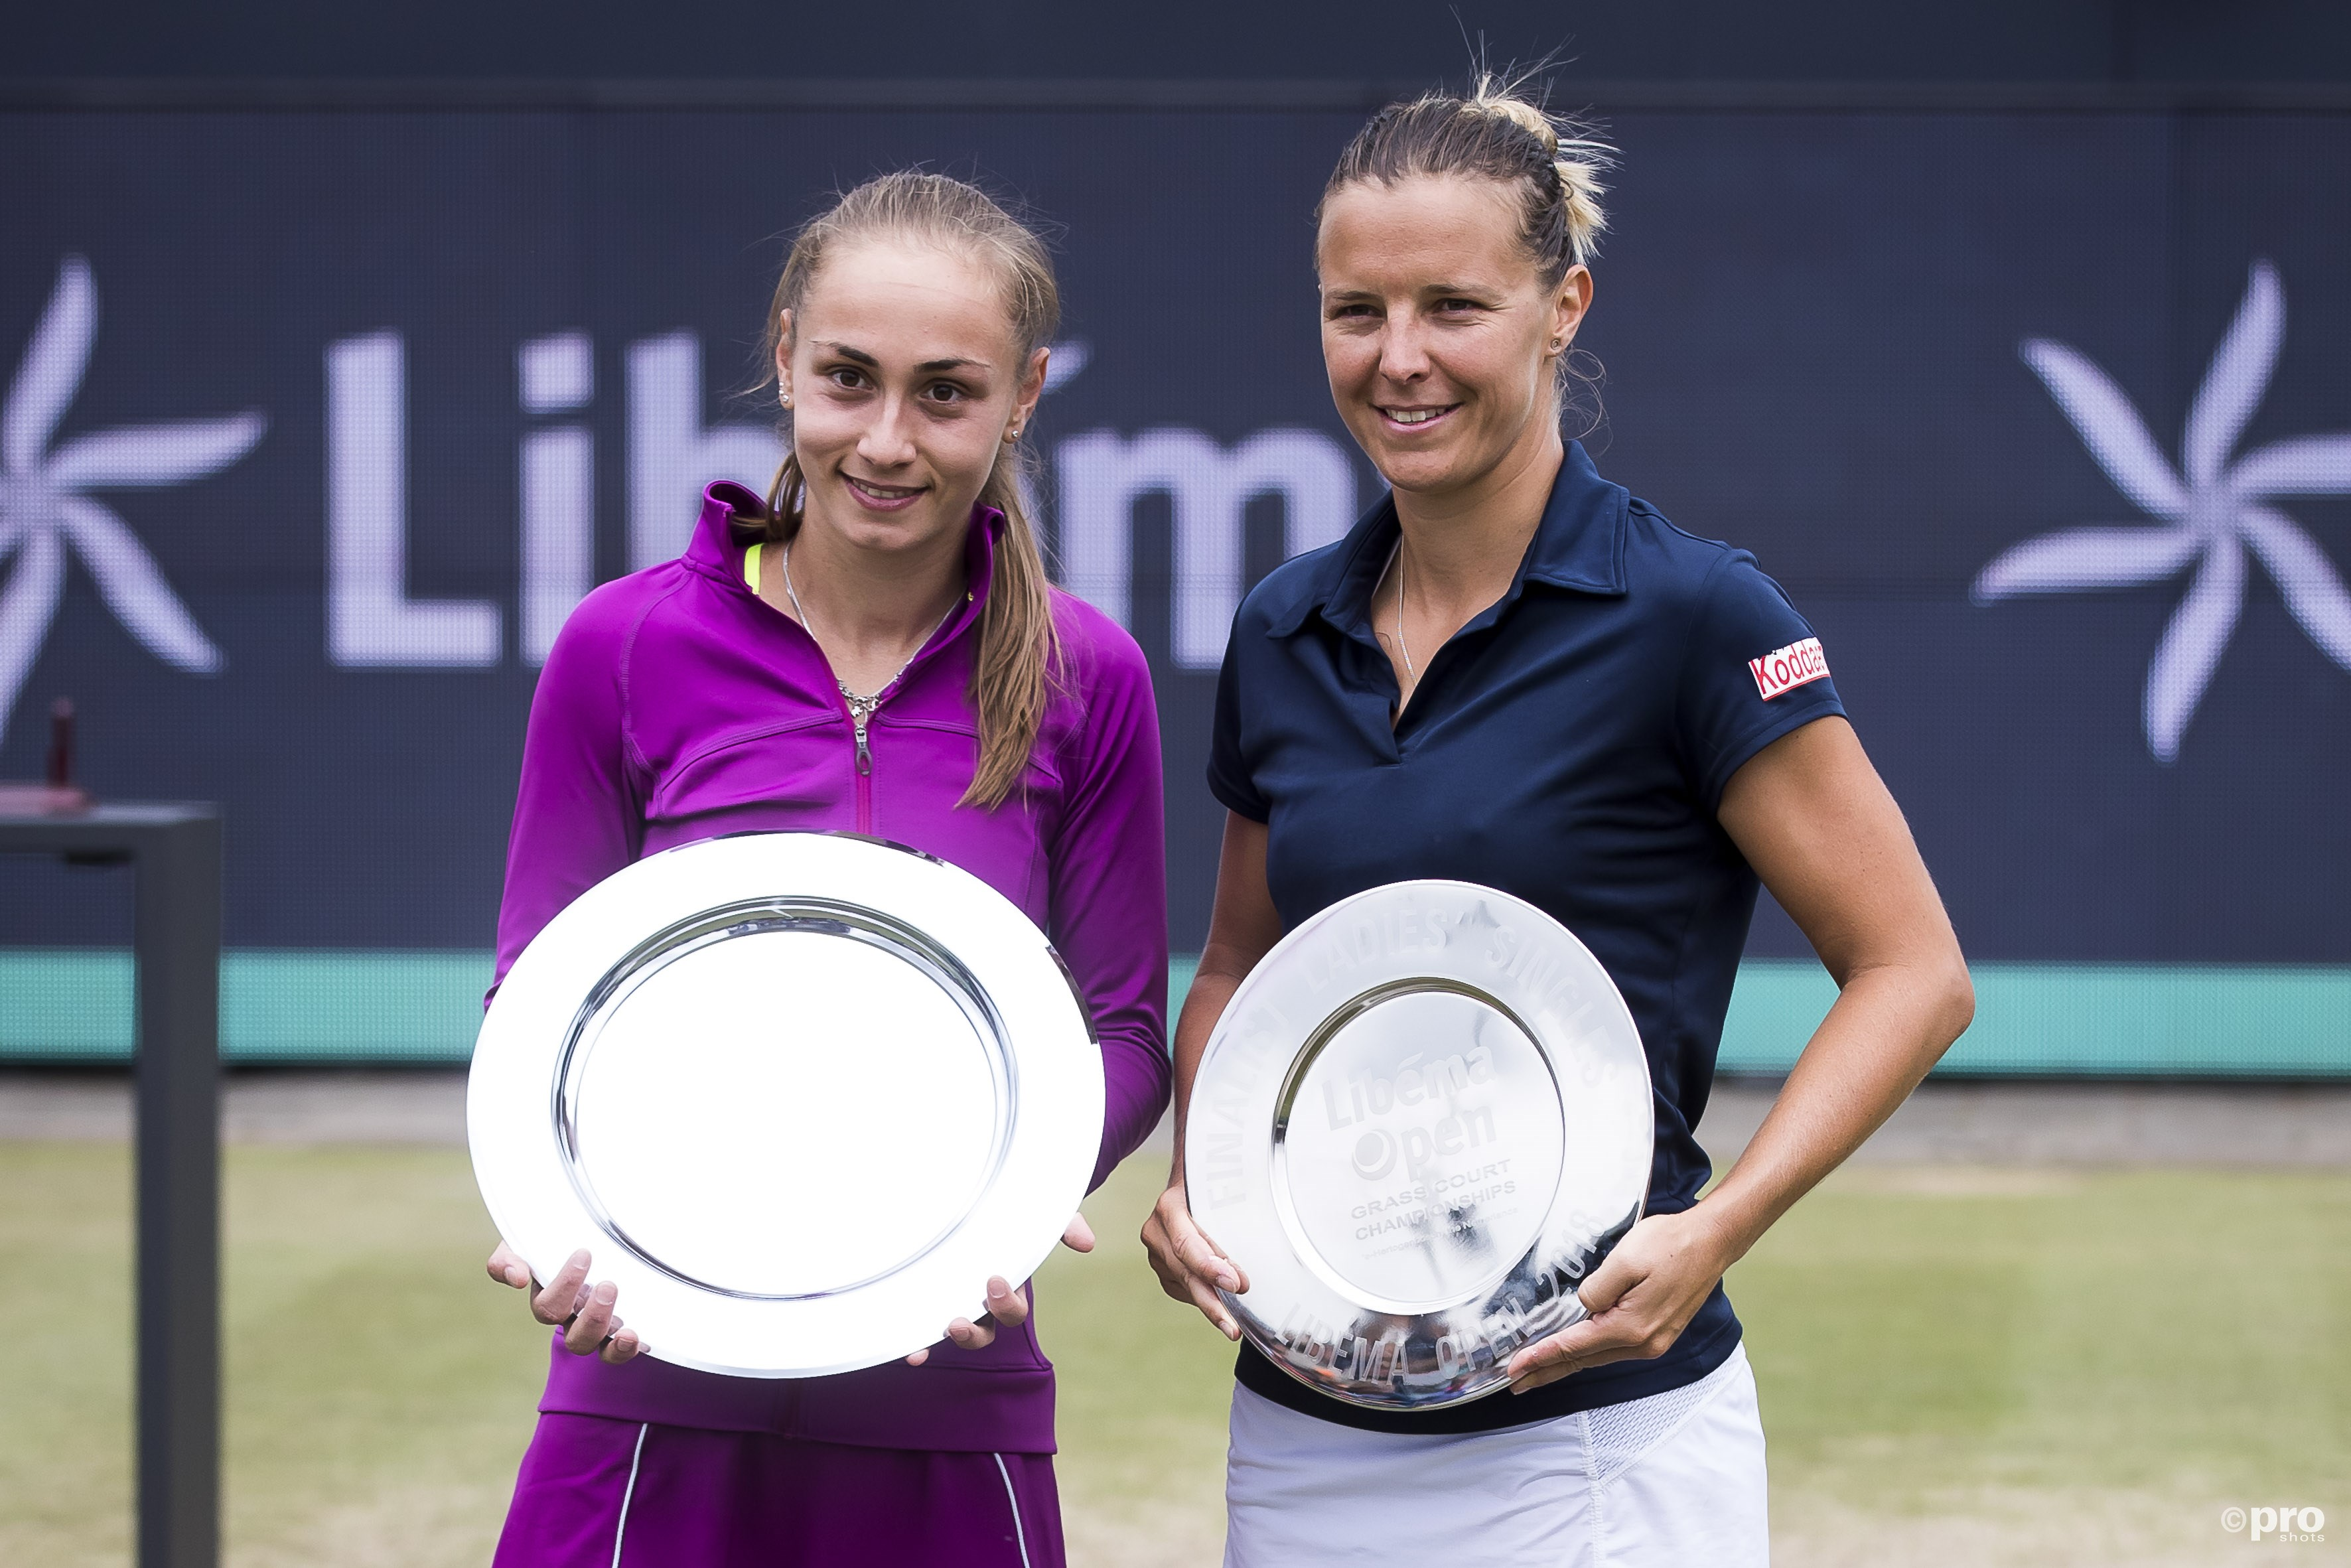 Aleksandra Krunic won de finale van Kirsten Flipkens. (PRO SHOTS/Joep Leenen)